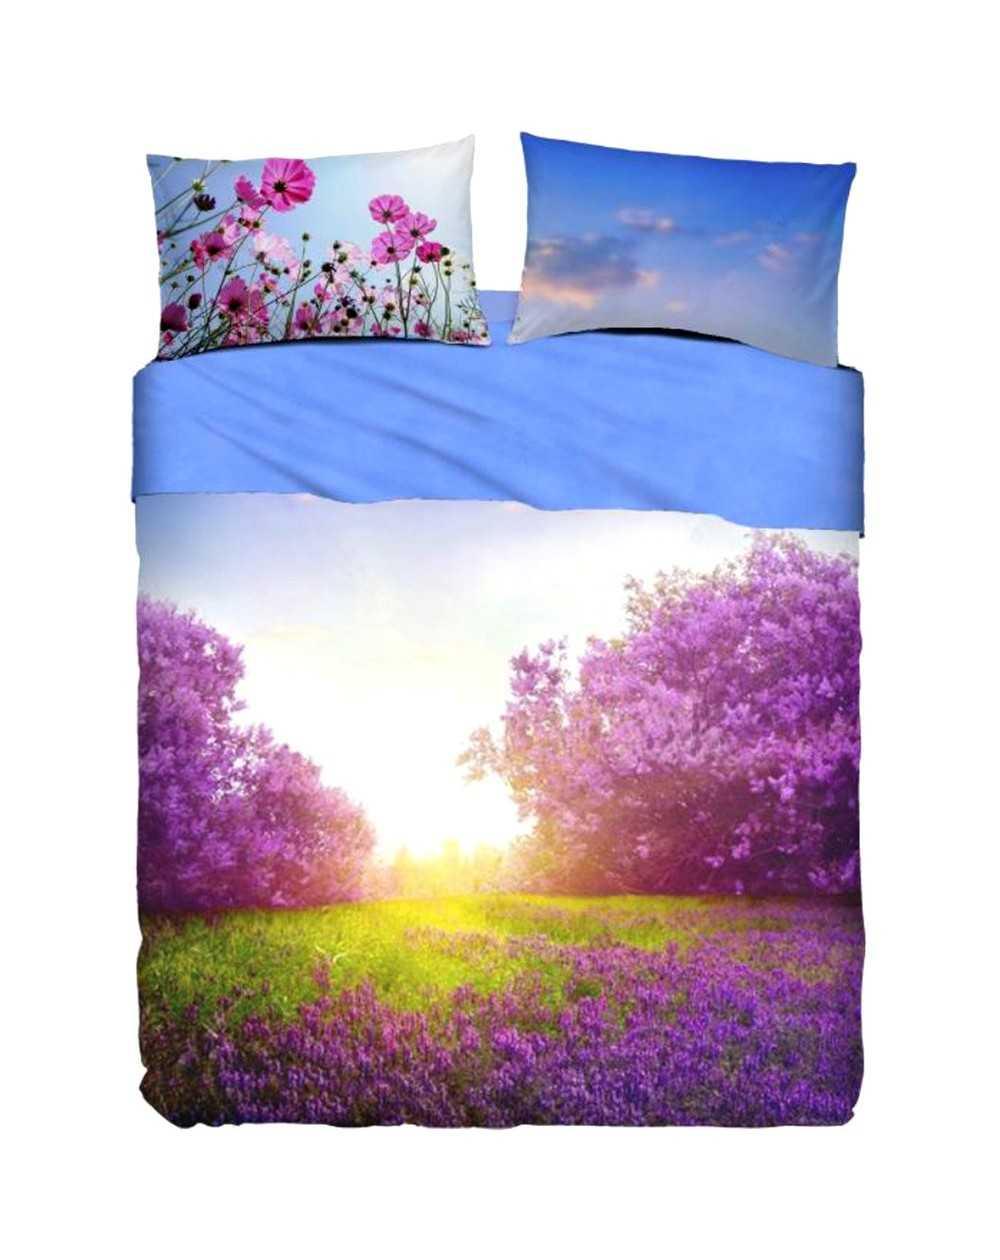 Lenzuola Matrimoniali Paesaggi.Super King Size Sheet Set Purple Summer